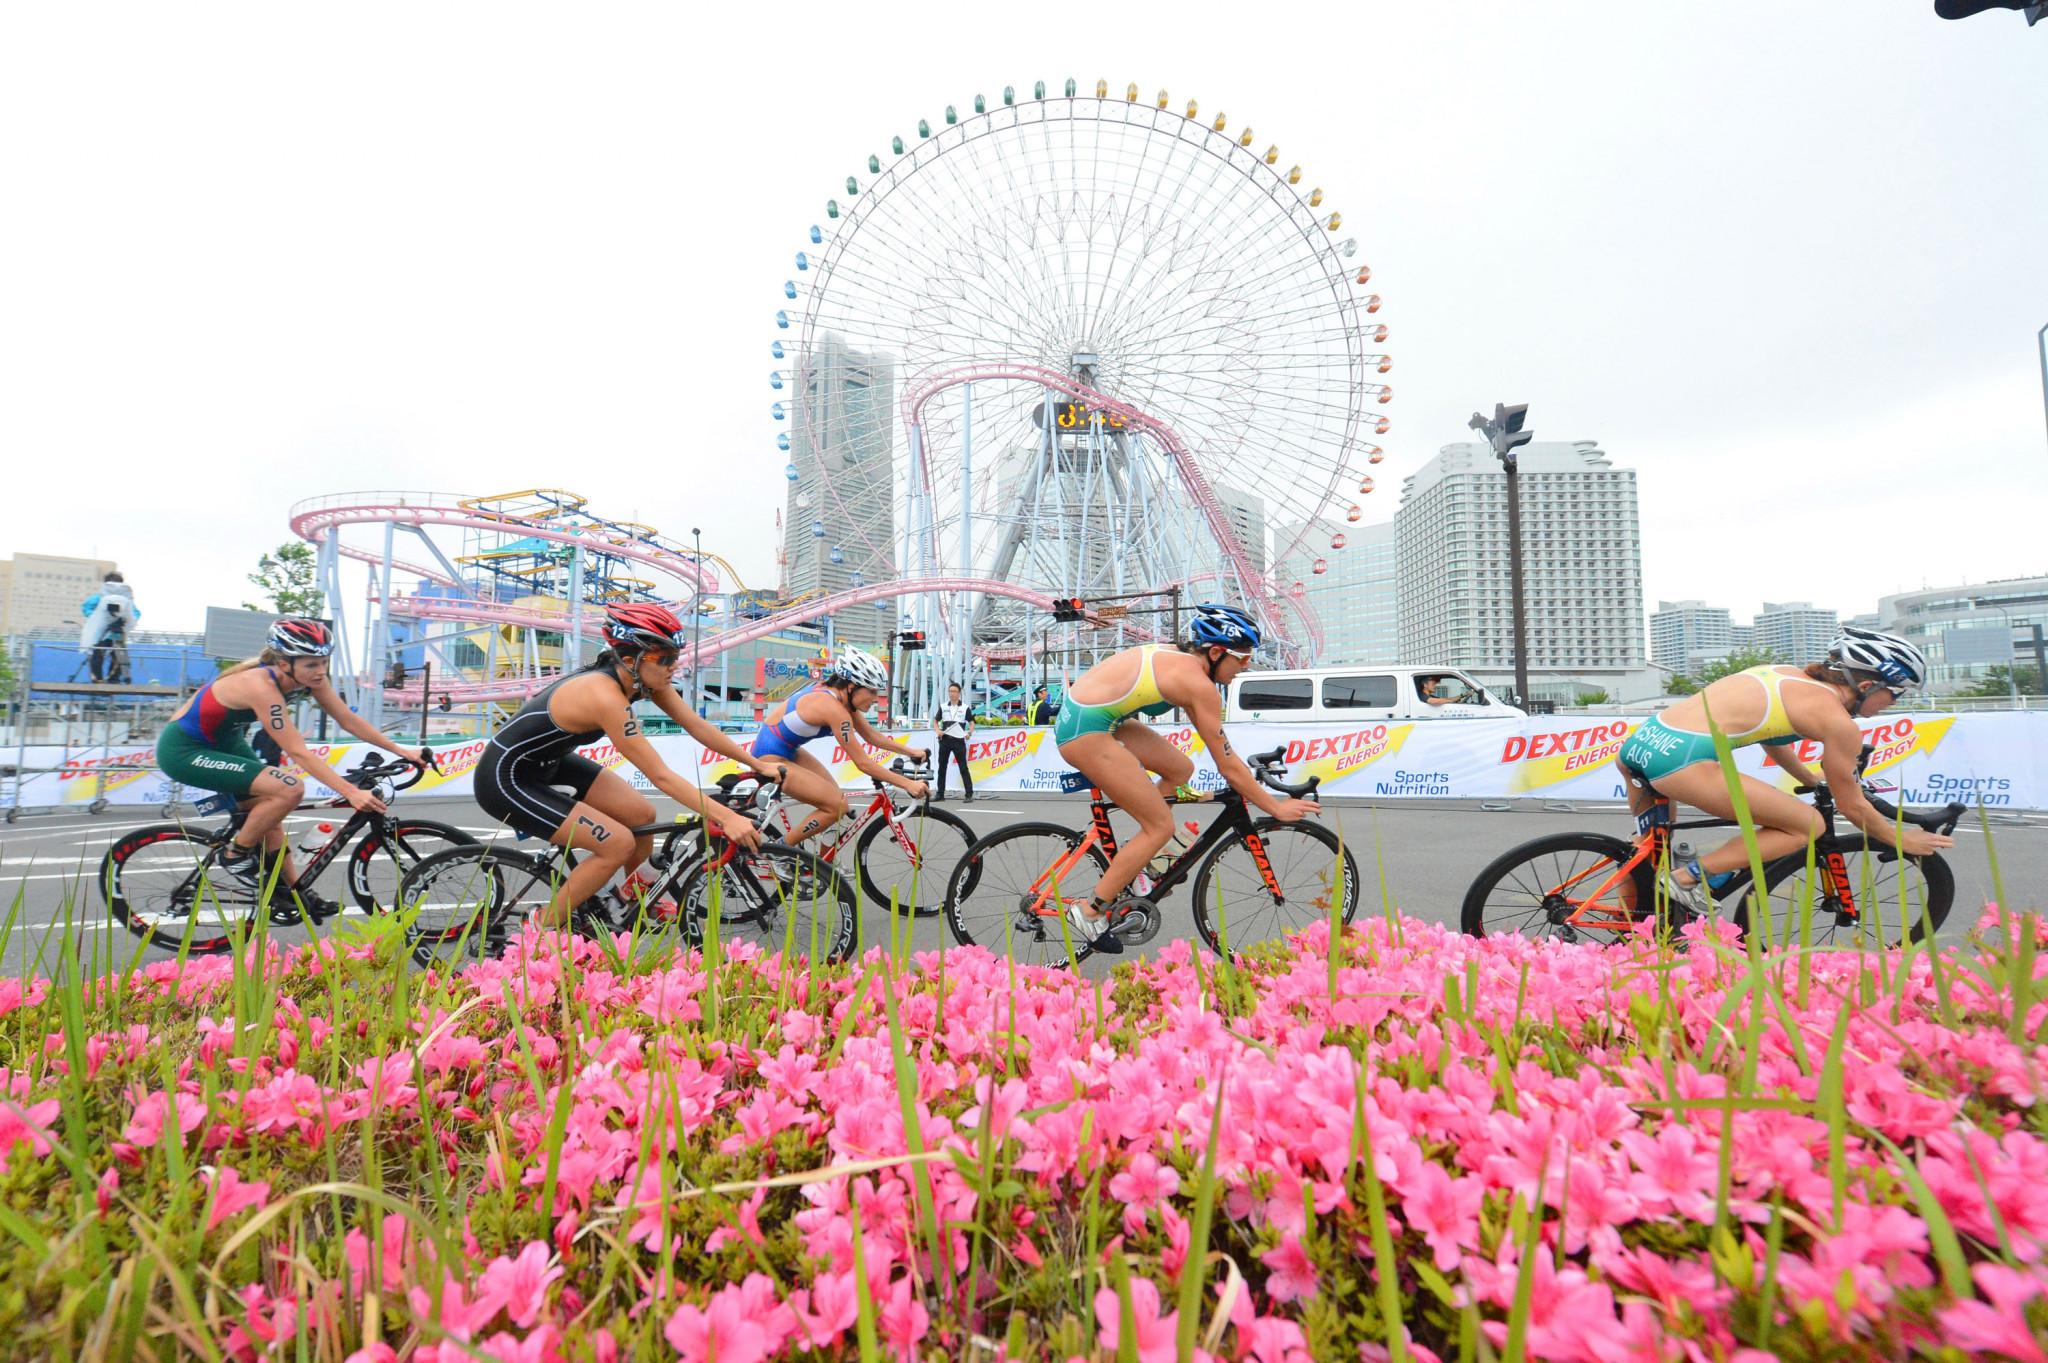 Yokohama to host first World Triathlon Championship and Para Series events of 2022